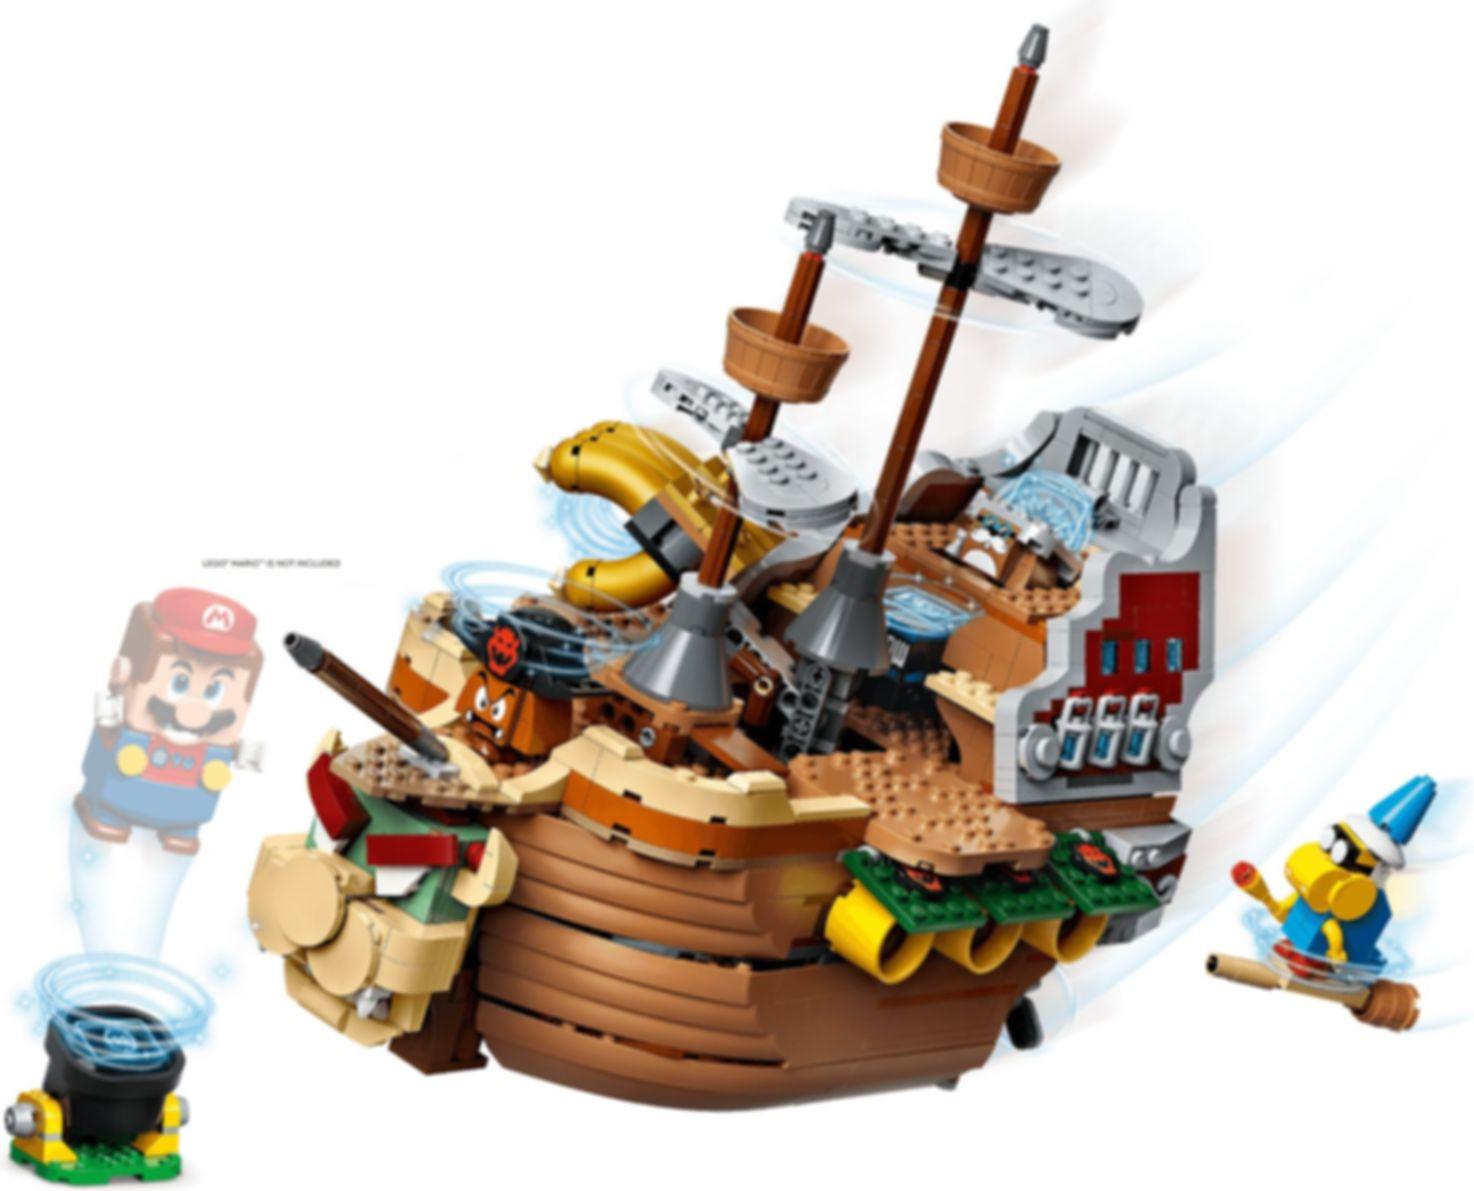 LEGO® Super Mario™ Bowser's Airship Expansion Set gameplay